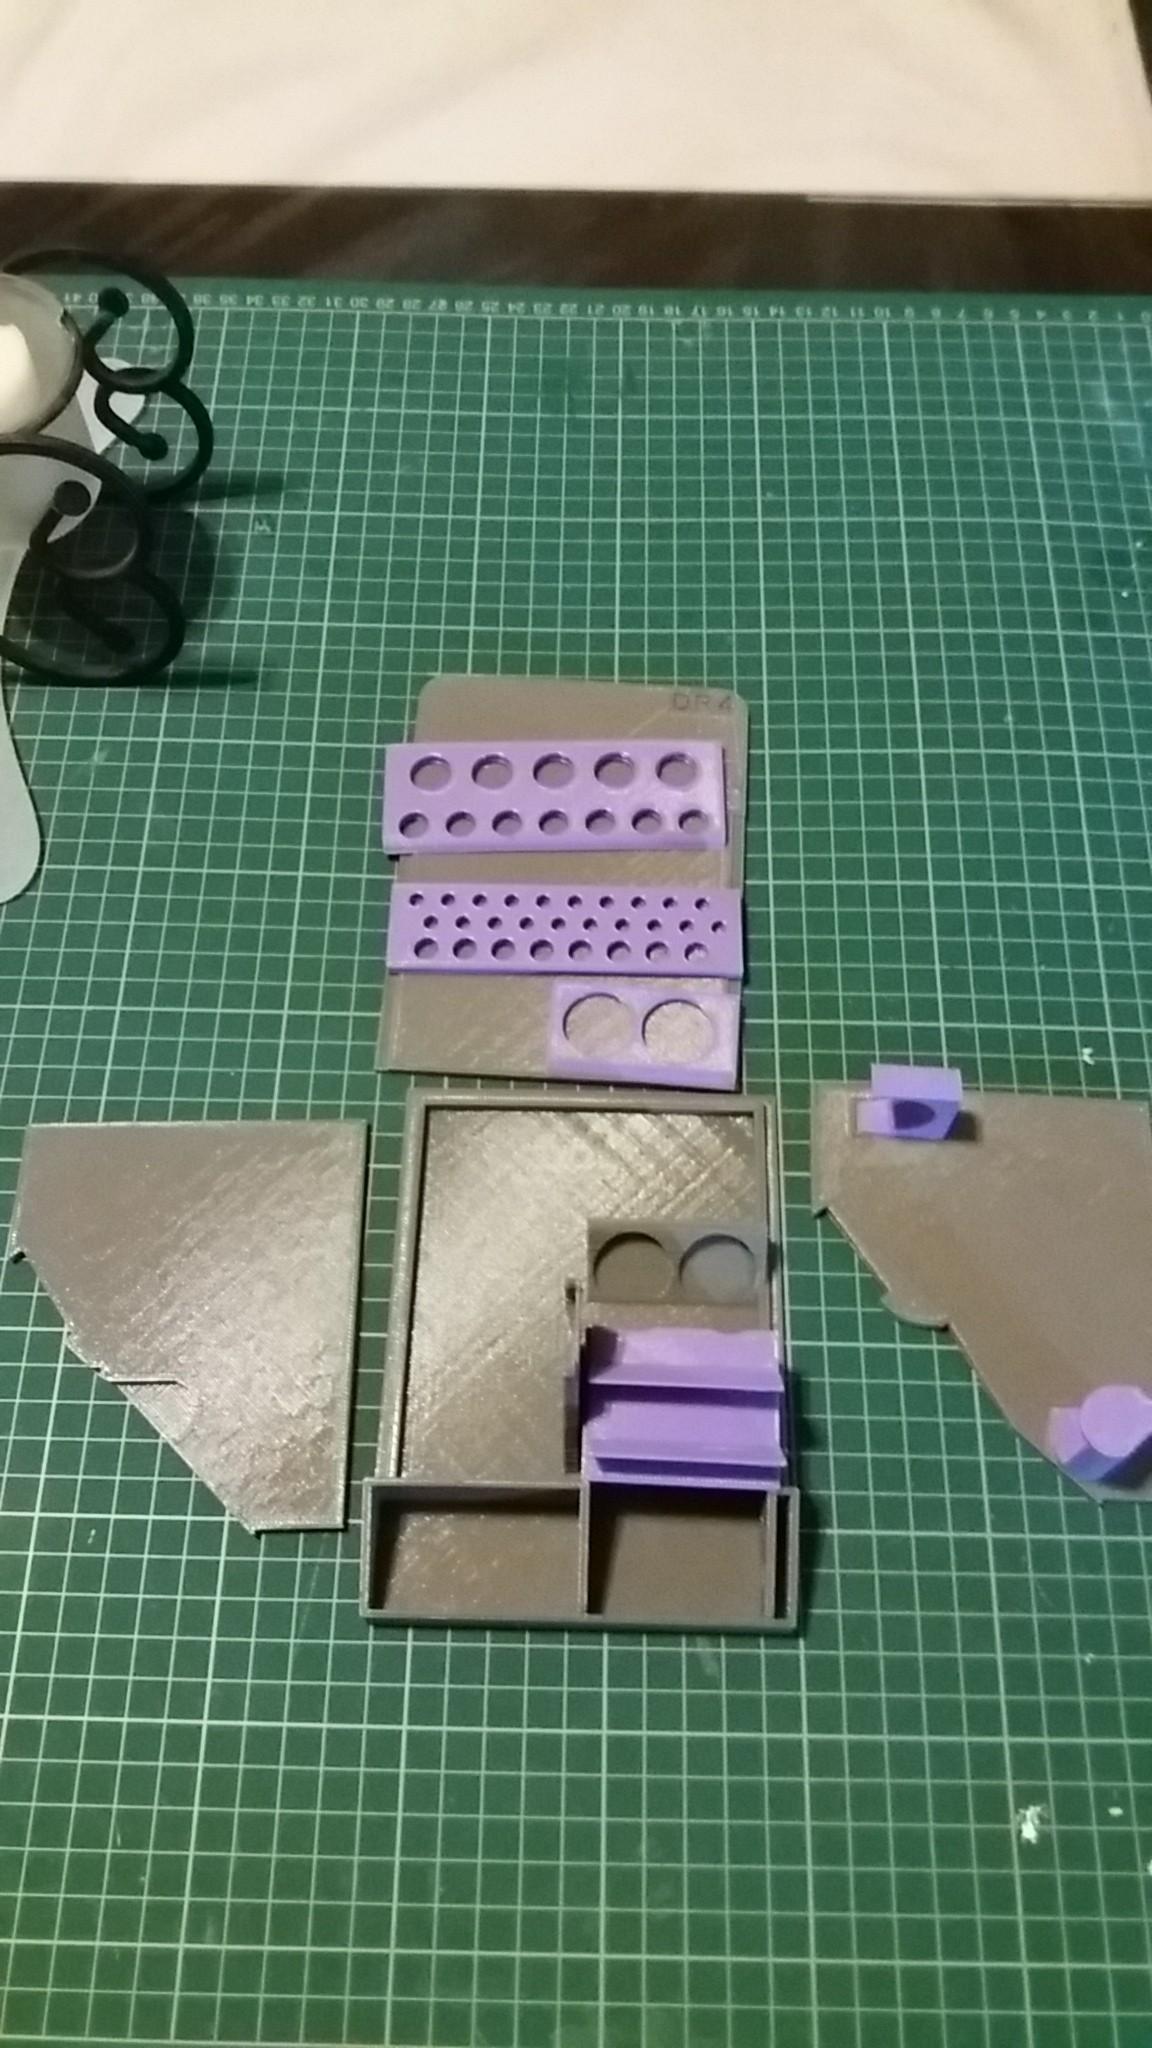 20170108_173951.jpg Download STL file Module for soldering iron N ° 4 • 3D print model, prusai33